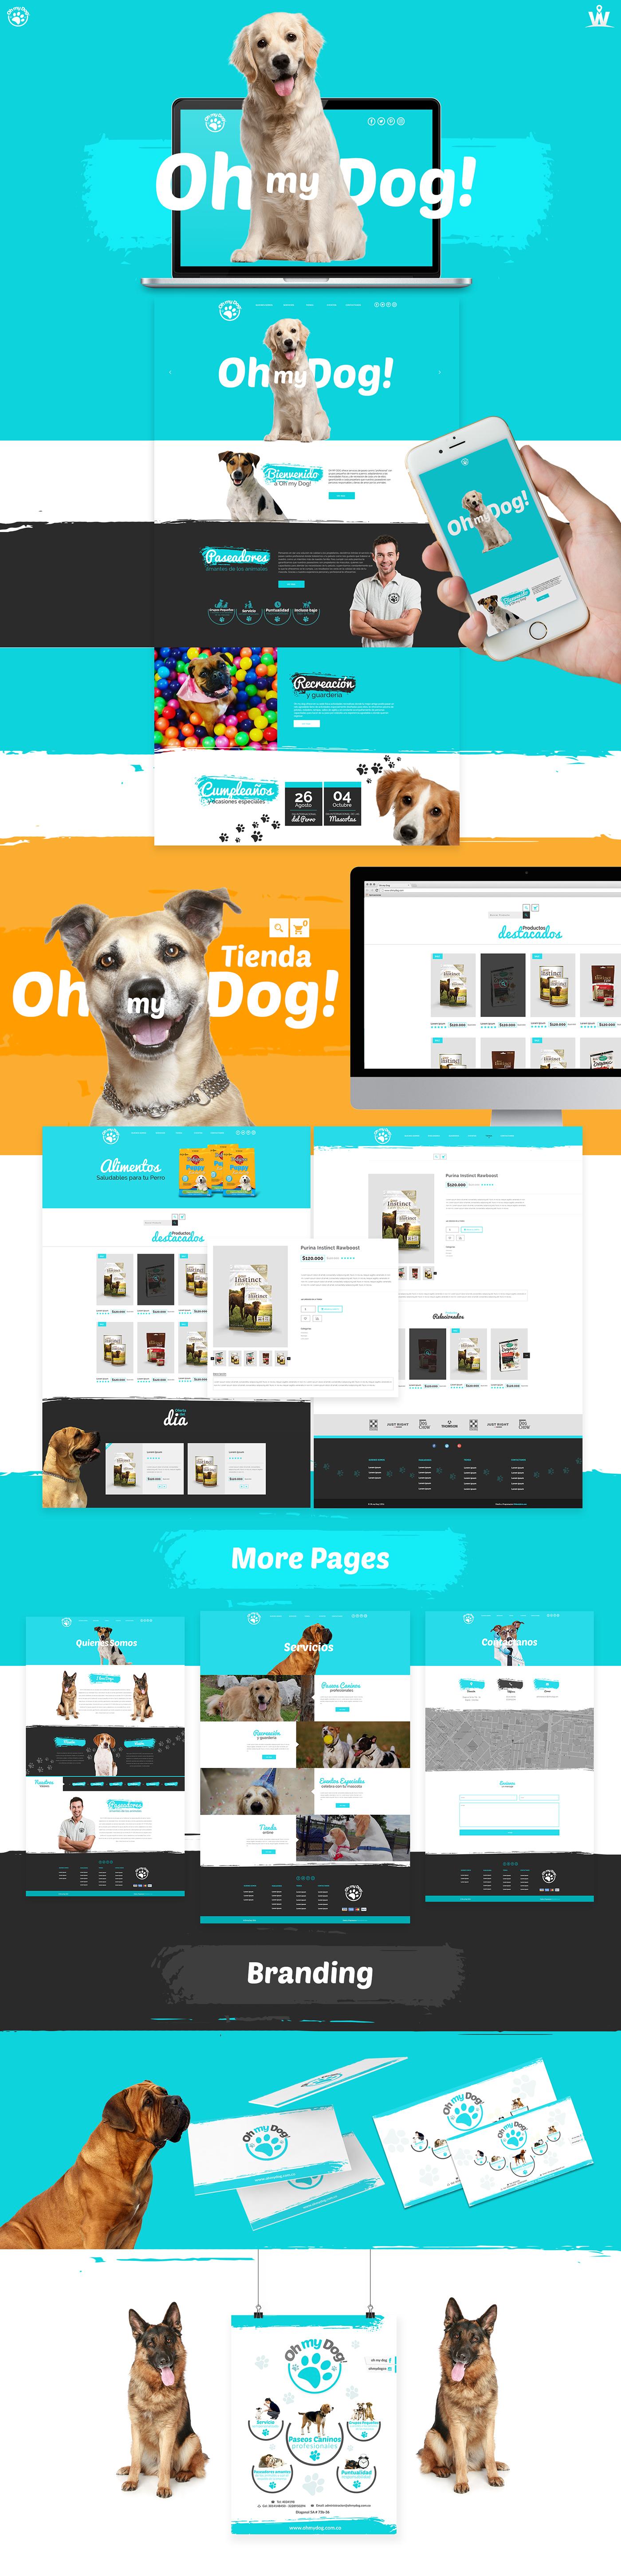 dog funny colors Webdesign Web